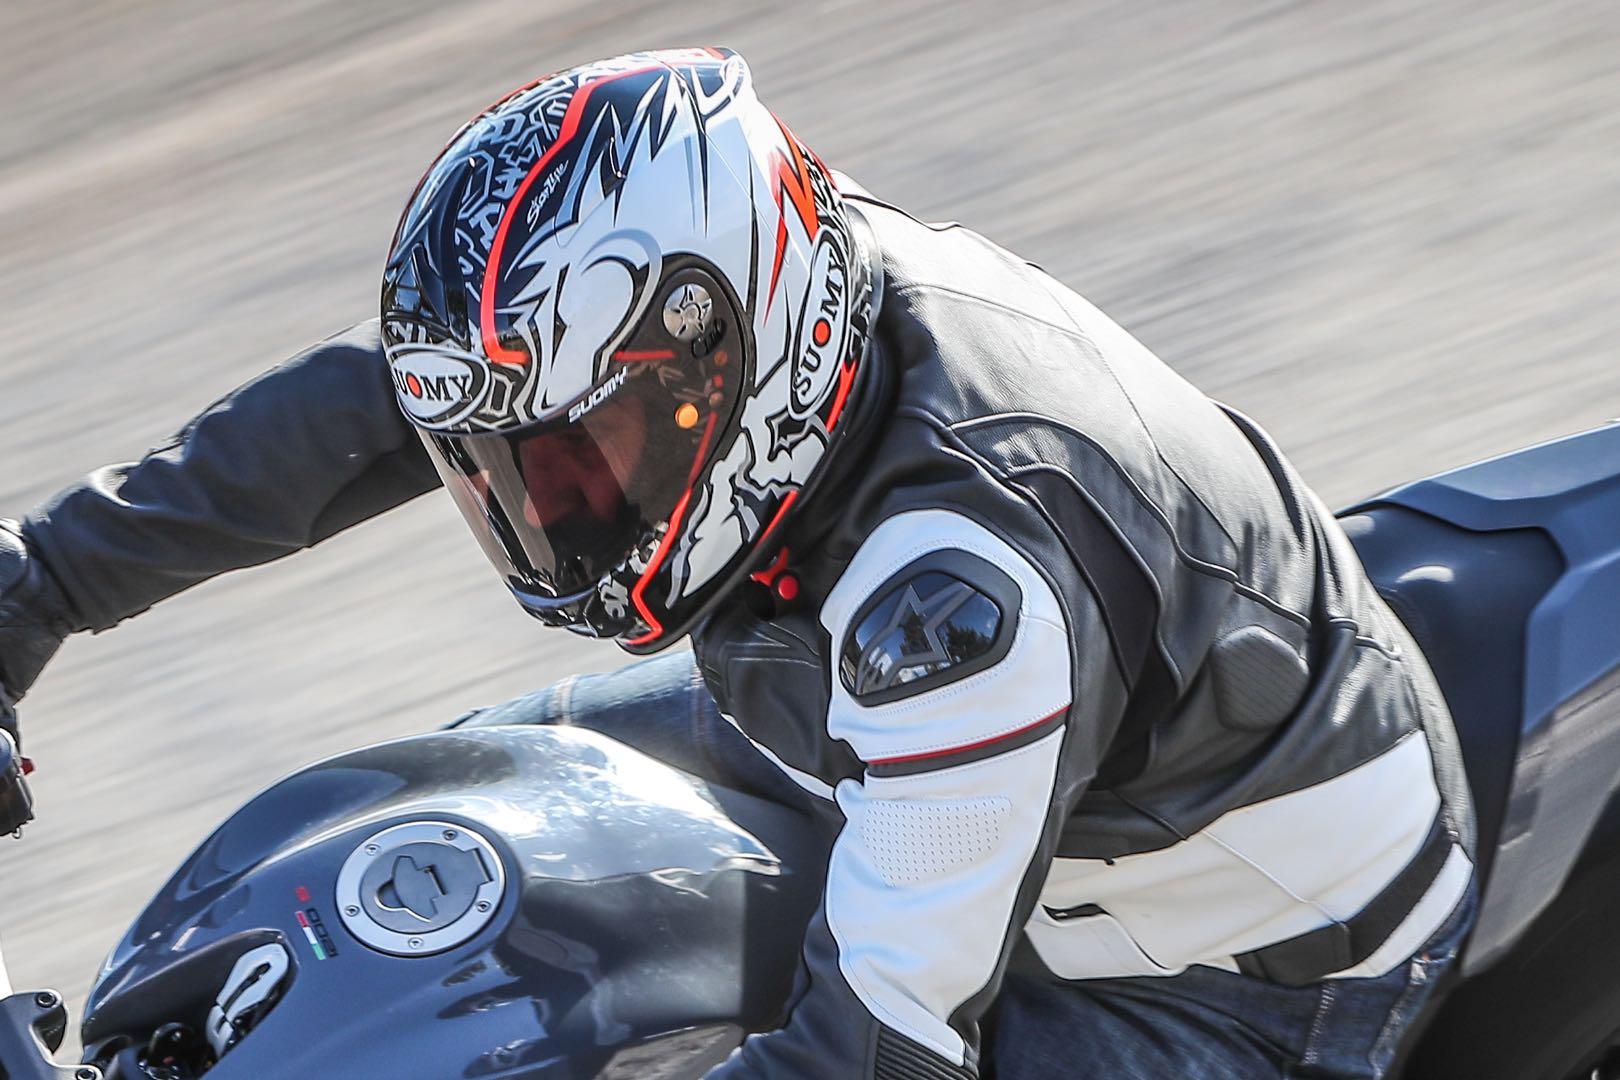 Suomy SR Sport Motorcycle Helmet Review